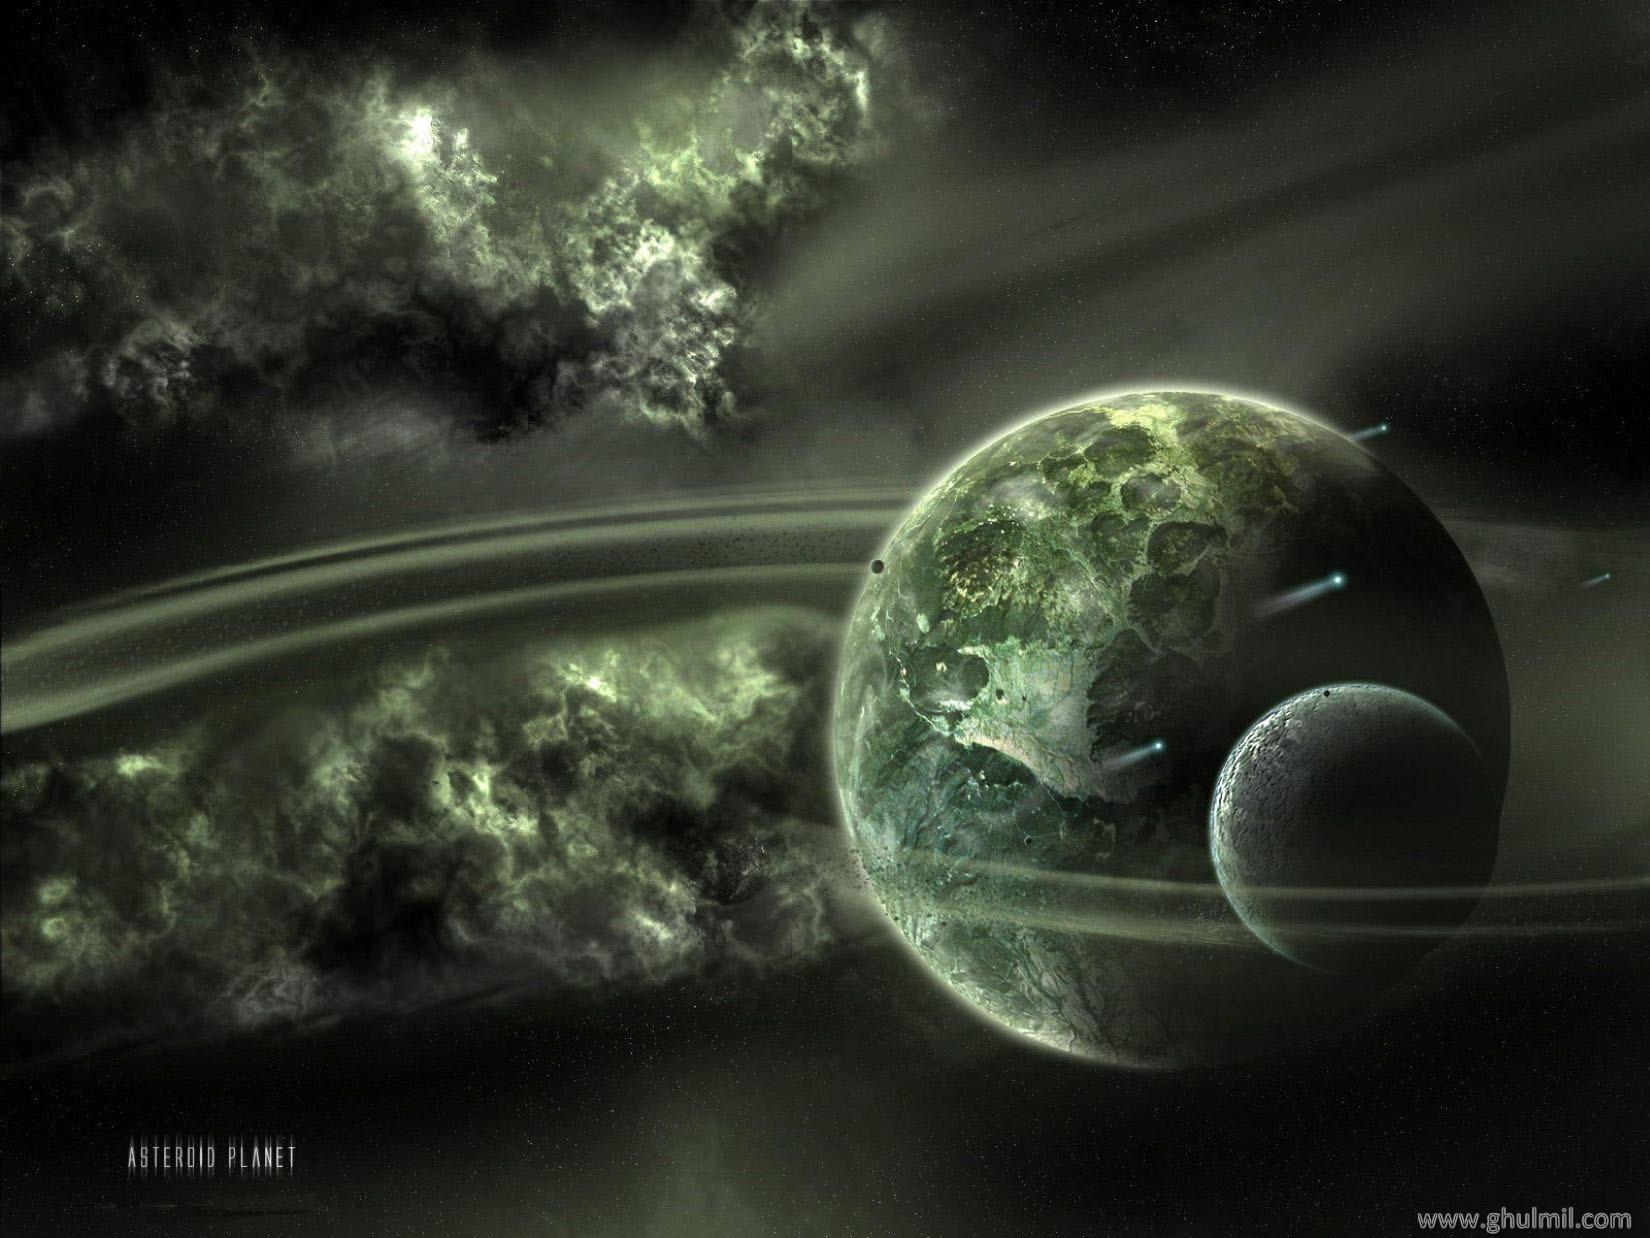 3d hd planets wallpaper for laptops E Entertainment 1650x1238